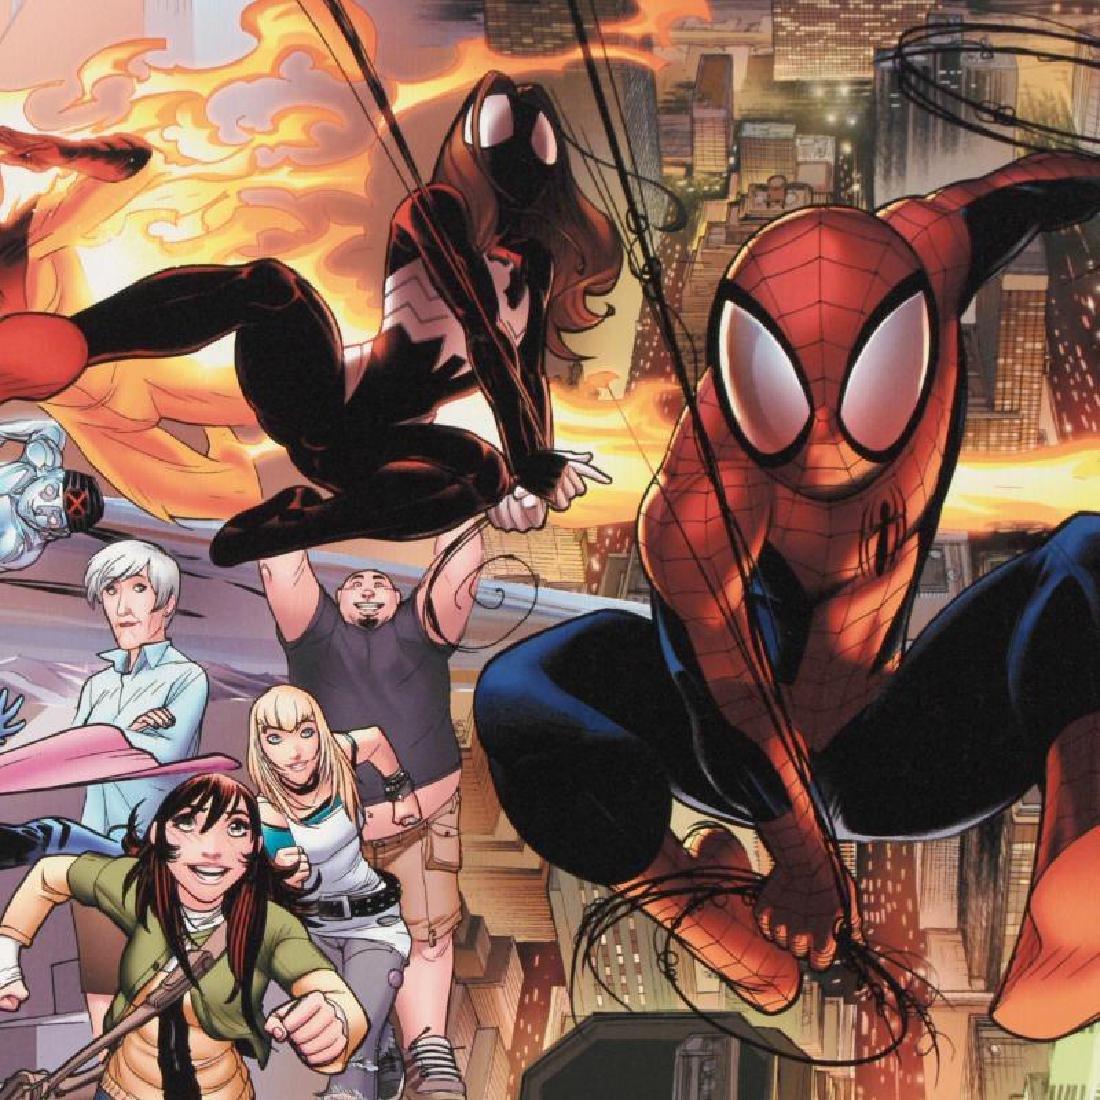 Ultimate Comics: Spider-Man #1 by Marvel Comics - 2